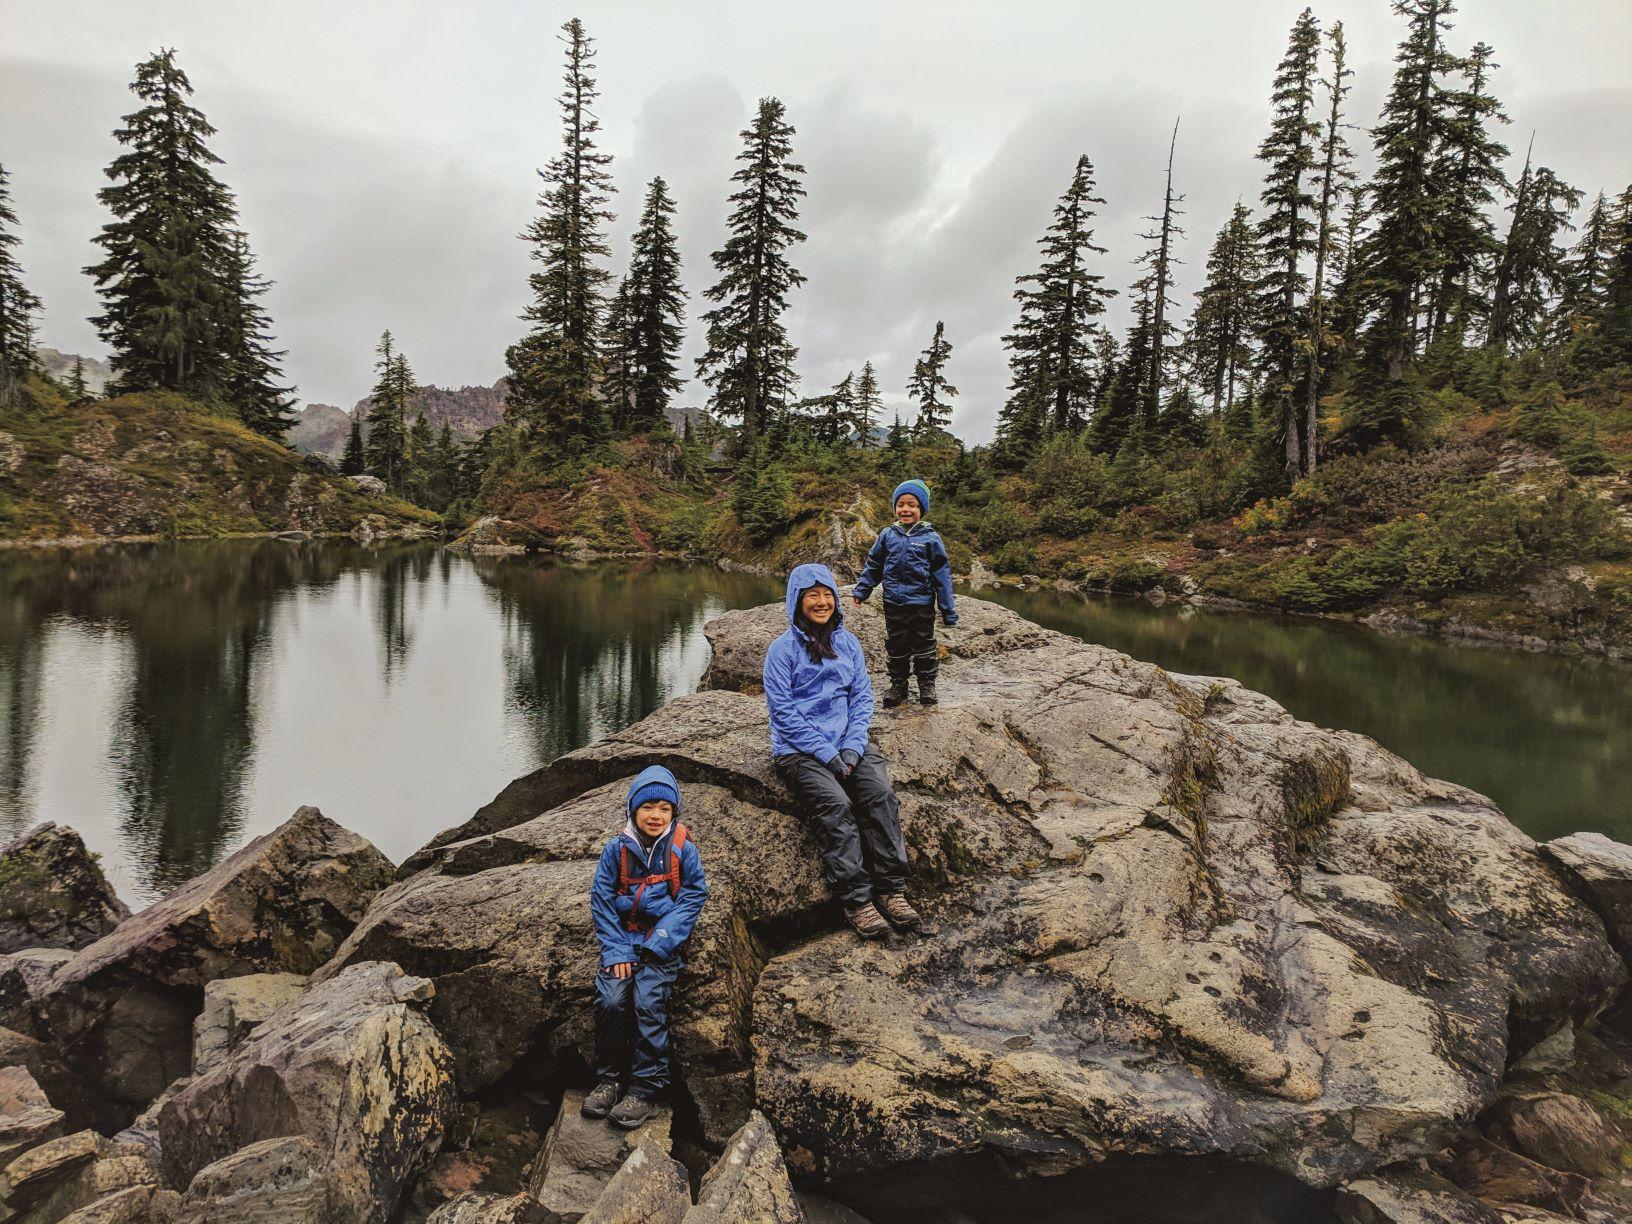 Matching rain gear at Independence Lake.